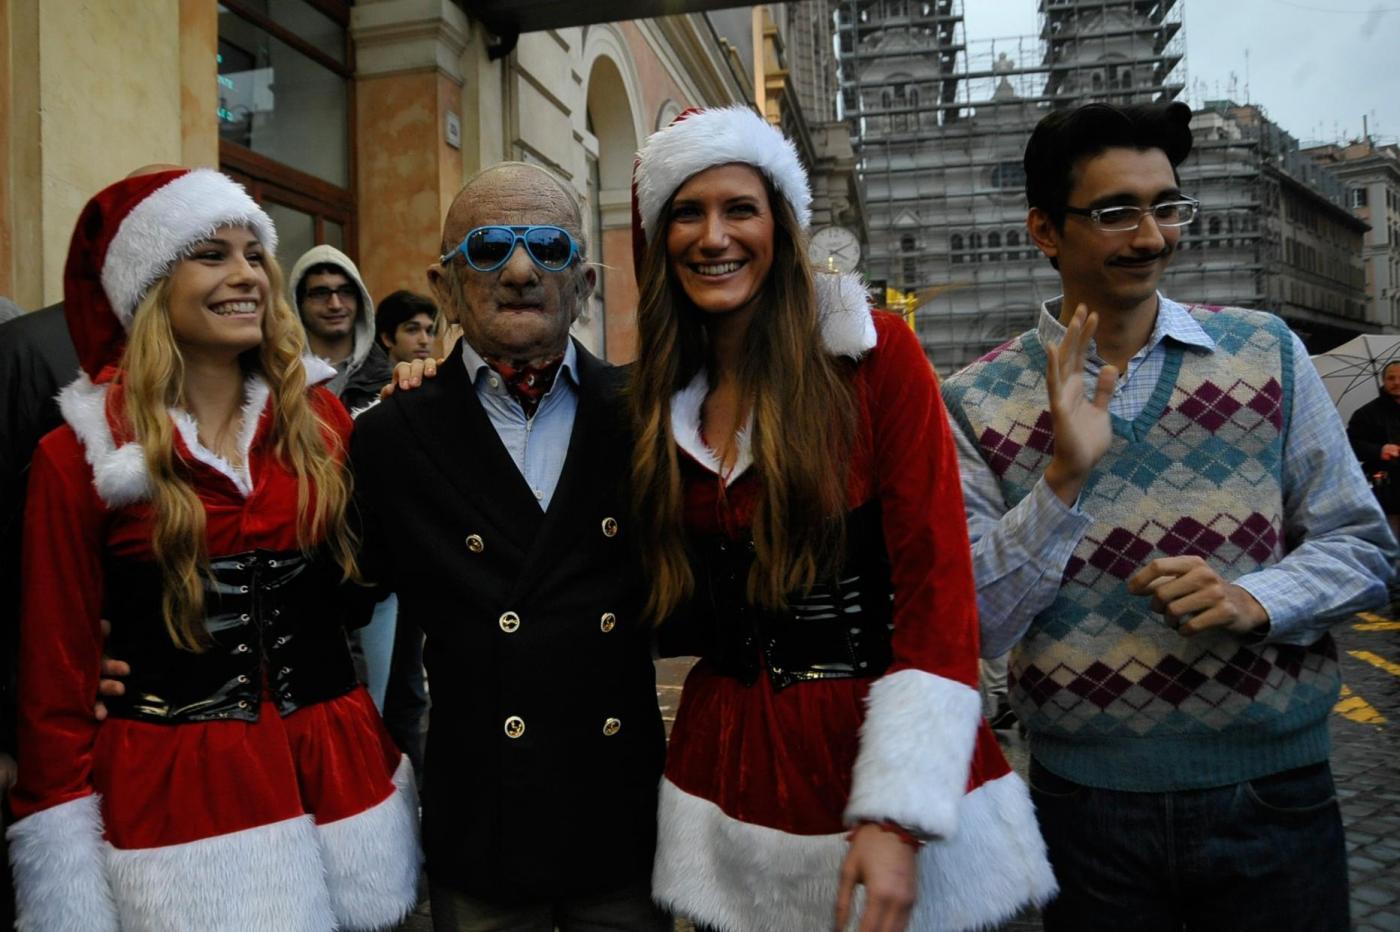 Christmas Carousel, I 2 soliti idioti